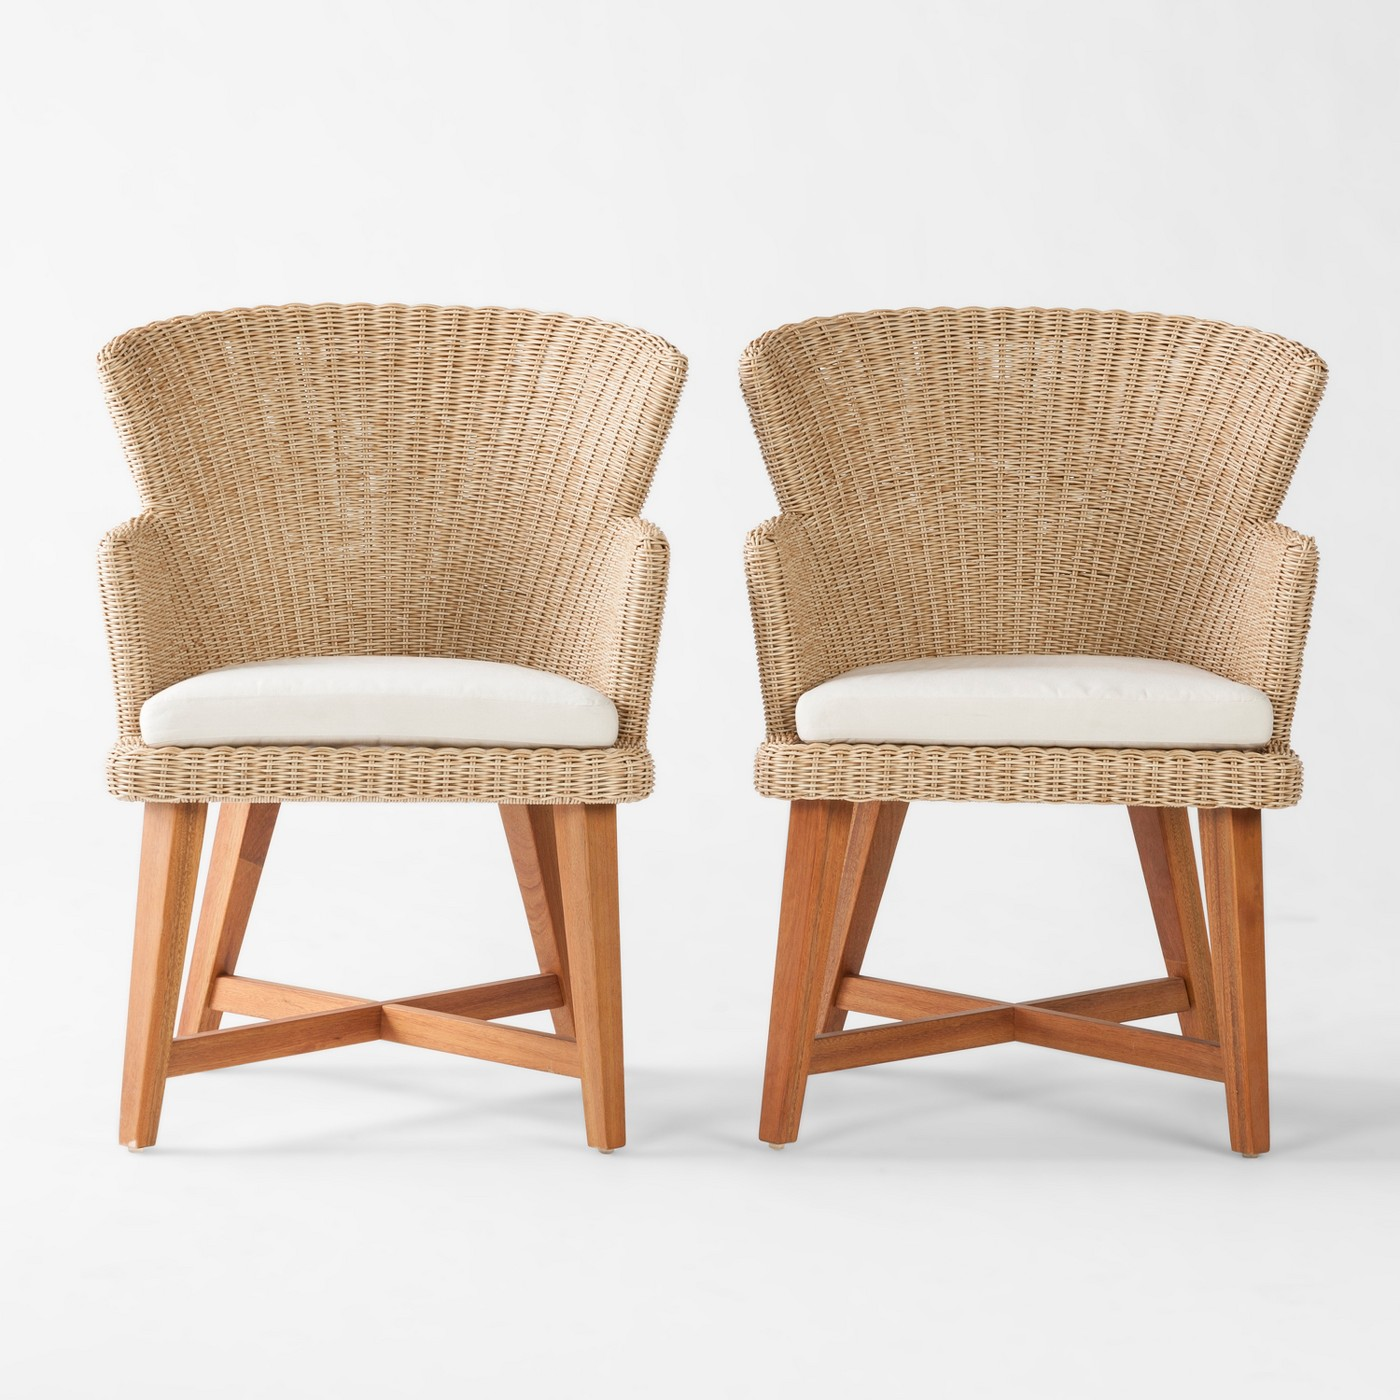 Staton 2pk Wood & All Weather Wicker Patio Dining Chair w/Sunbrella Cushion - Brown/Beige - Smith & Hawken™ - image 1 of 5